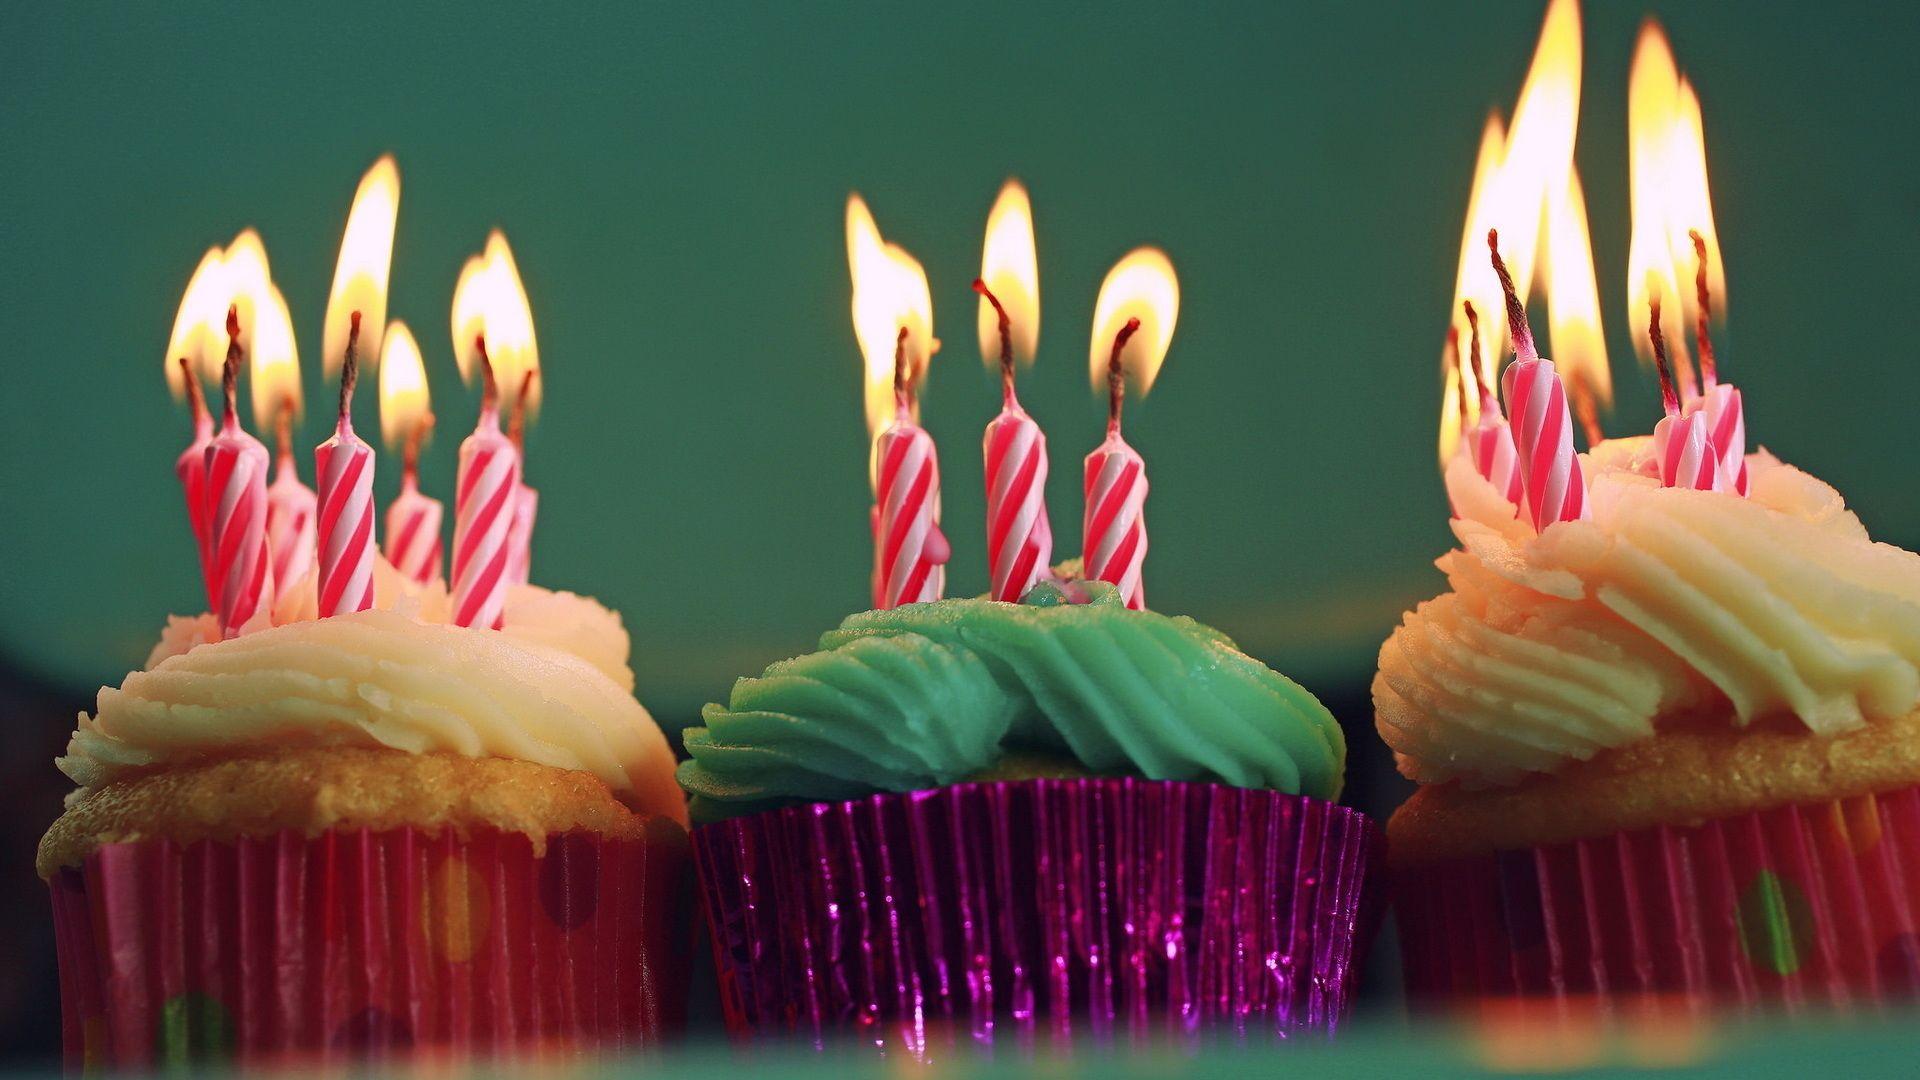 Birthday Cake hd wallpaper for laptop